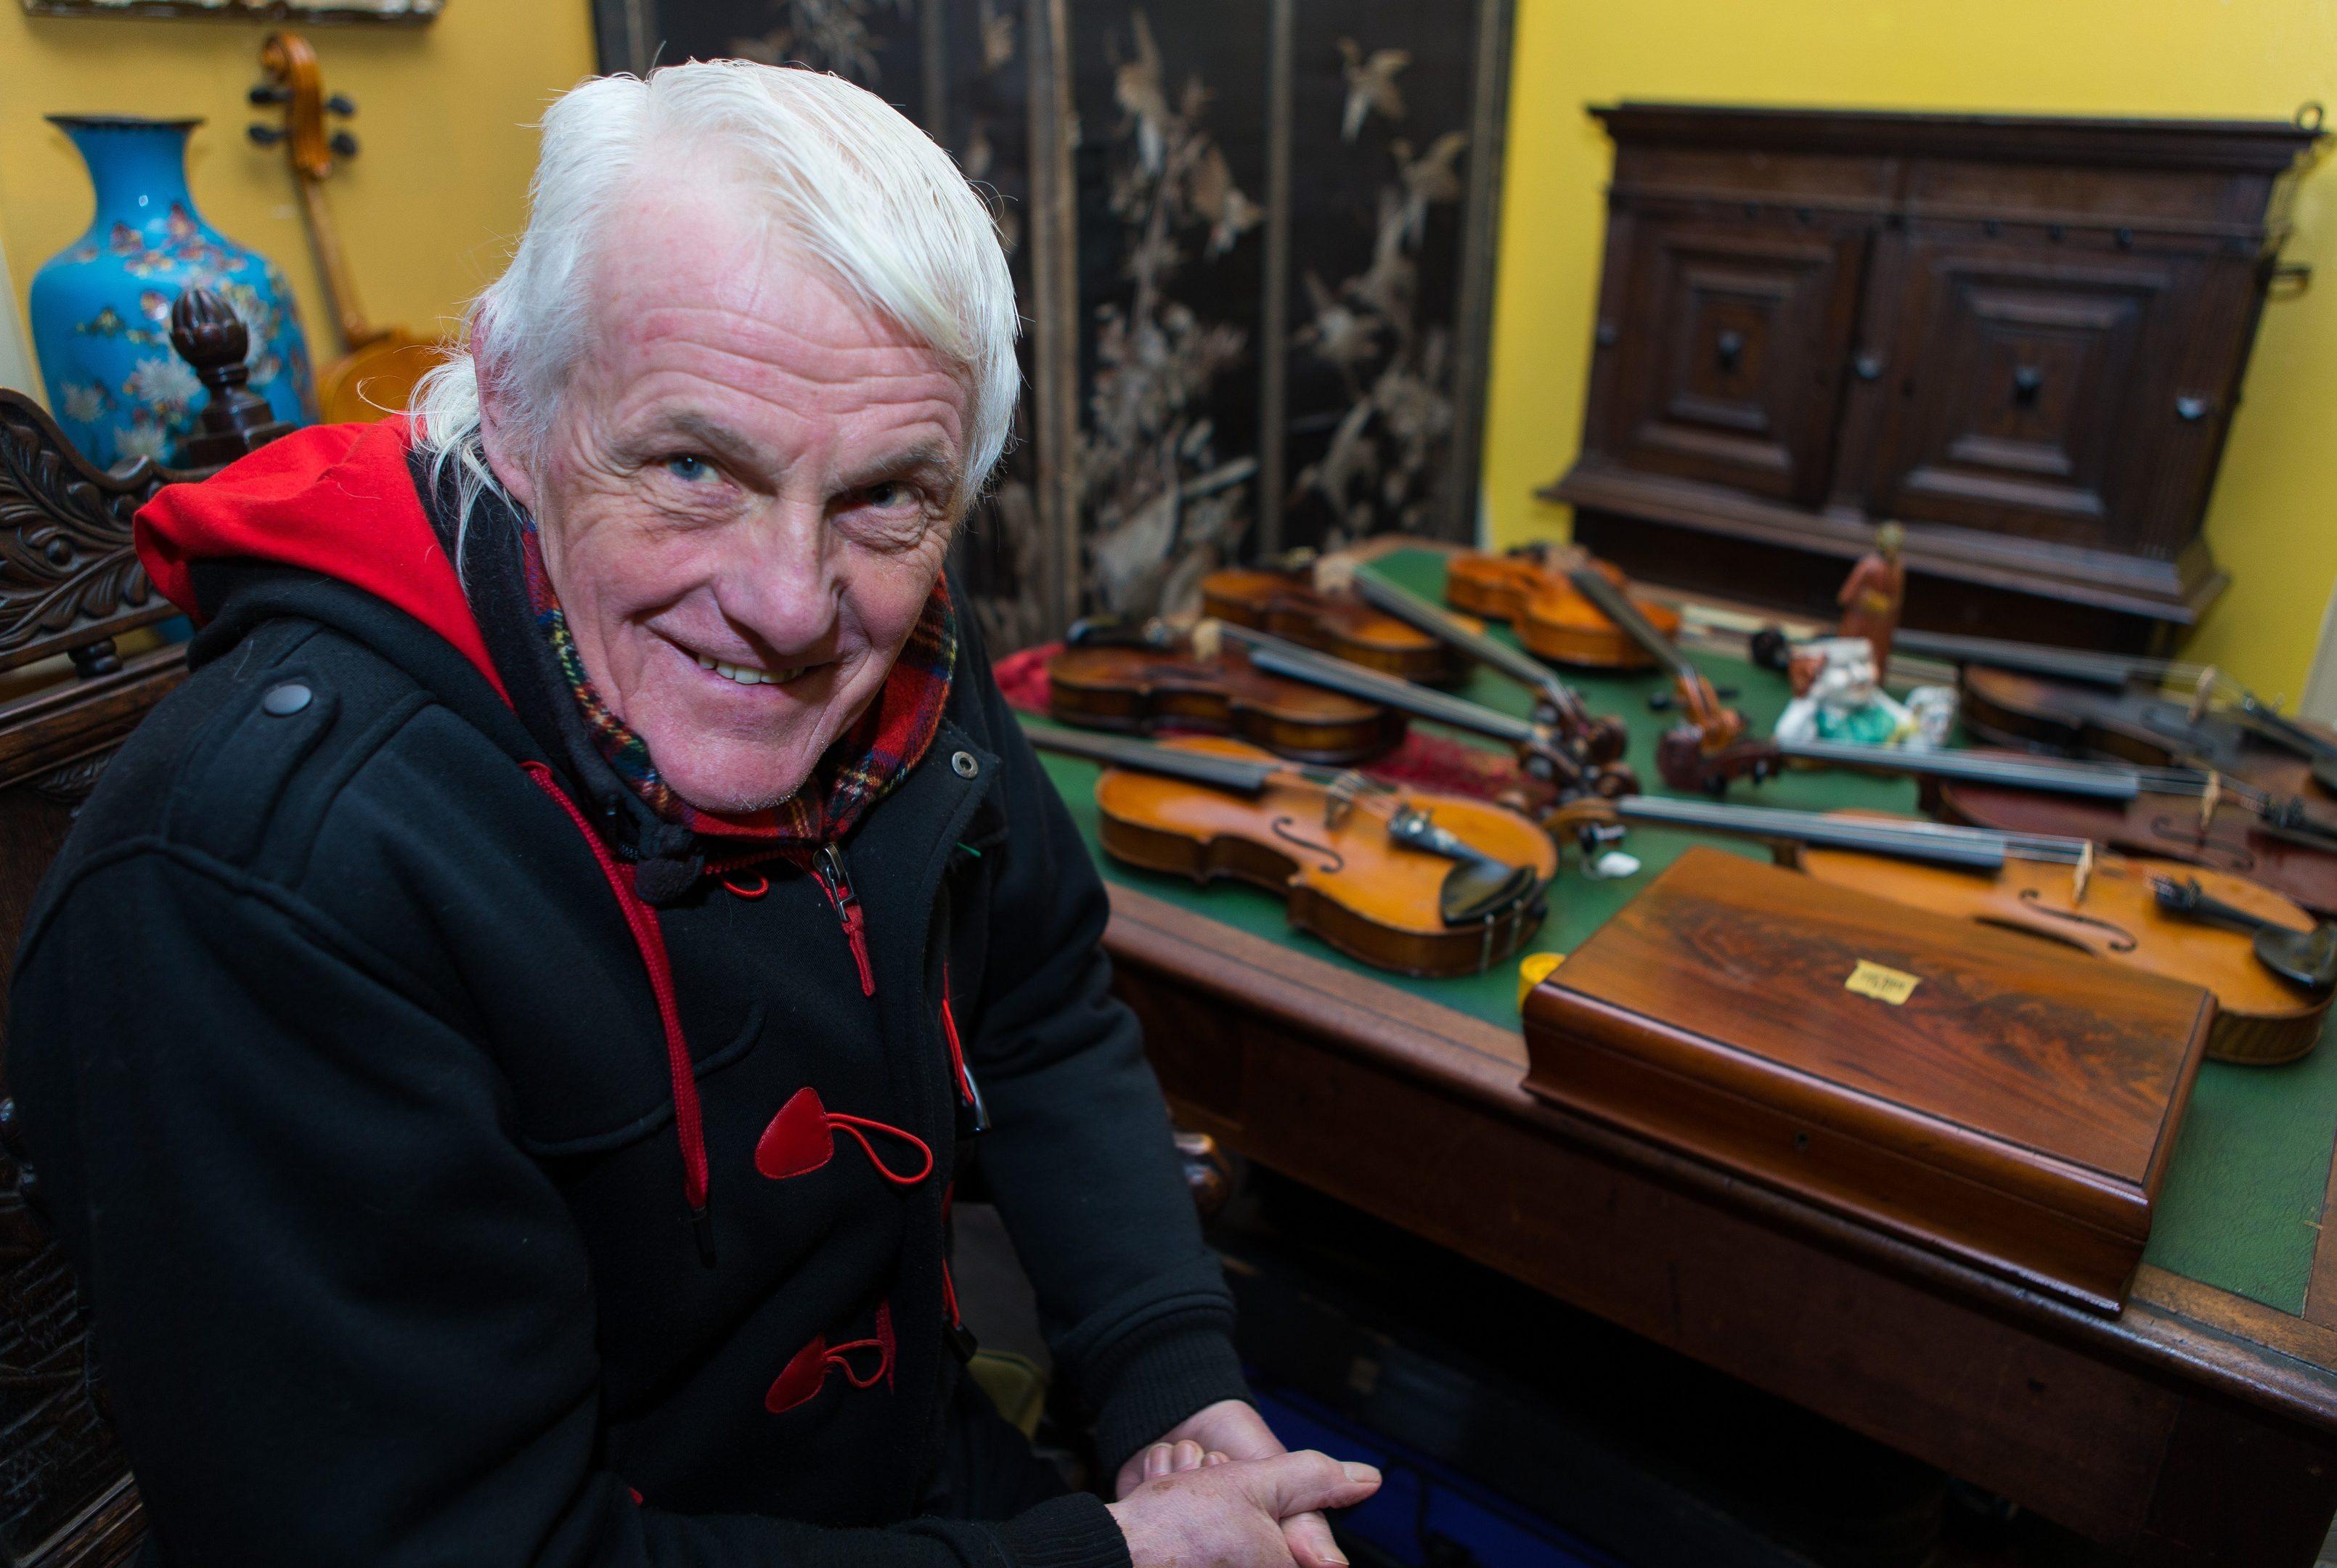 Bob Beveridge at his Violin Shop in Falkland